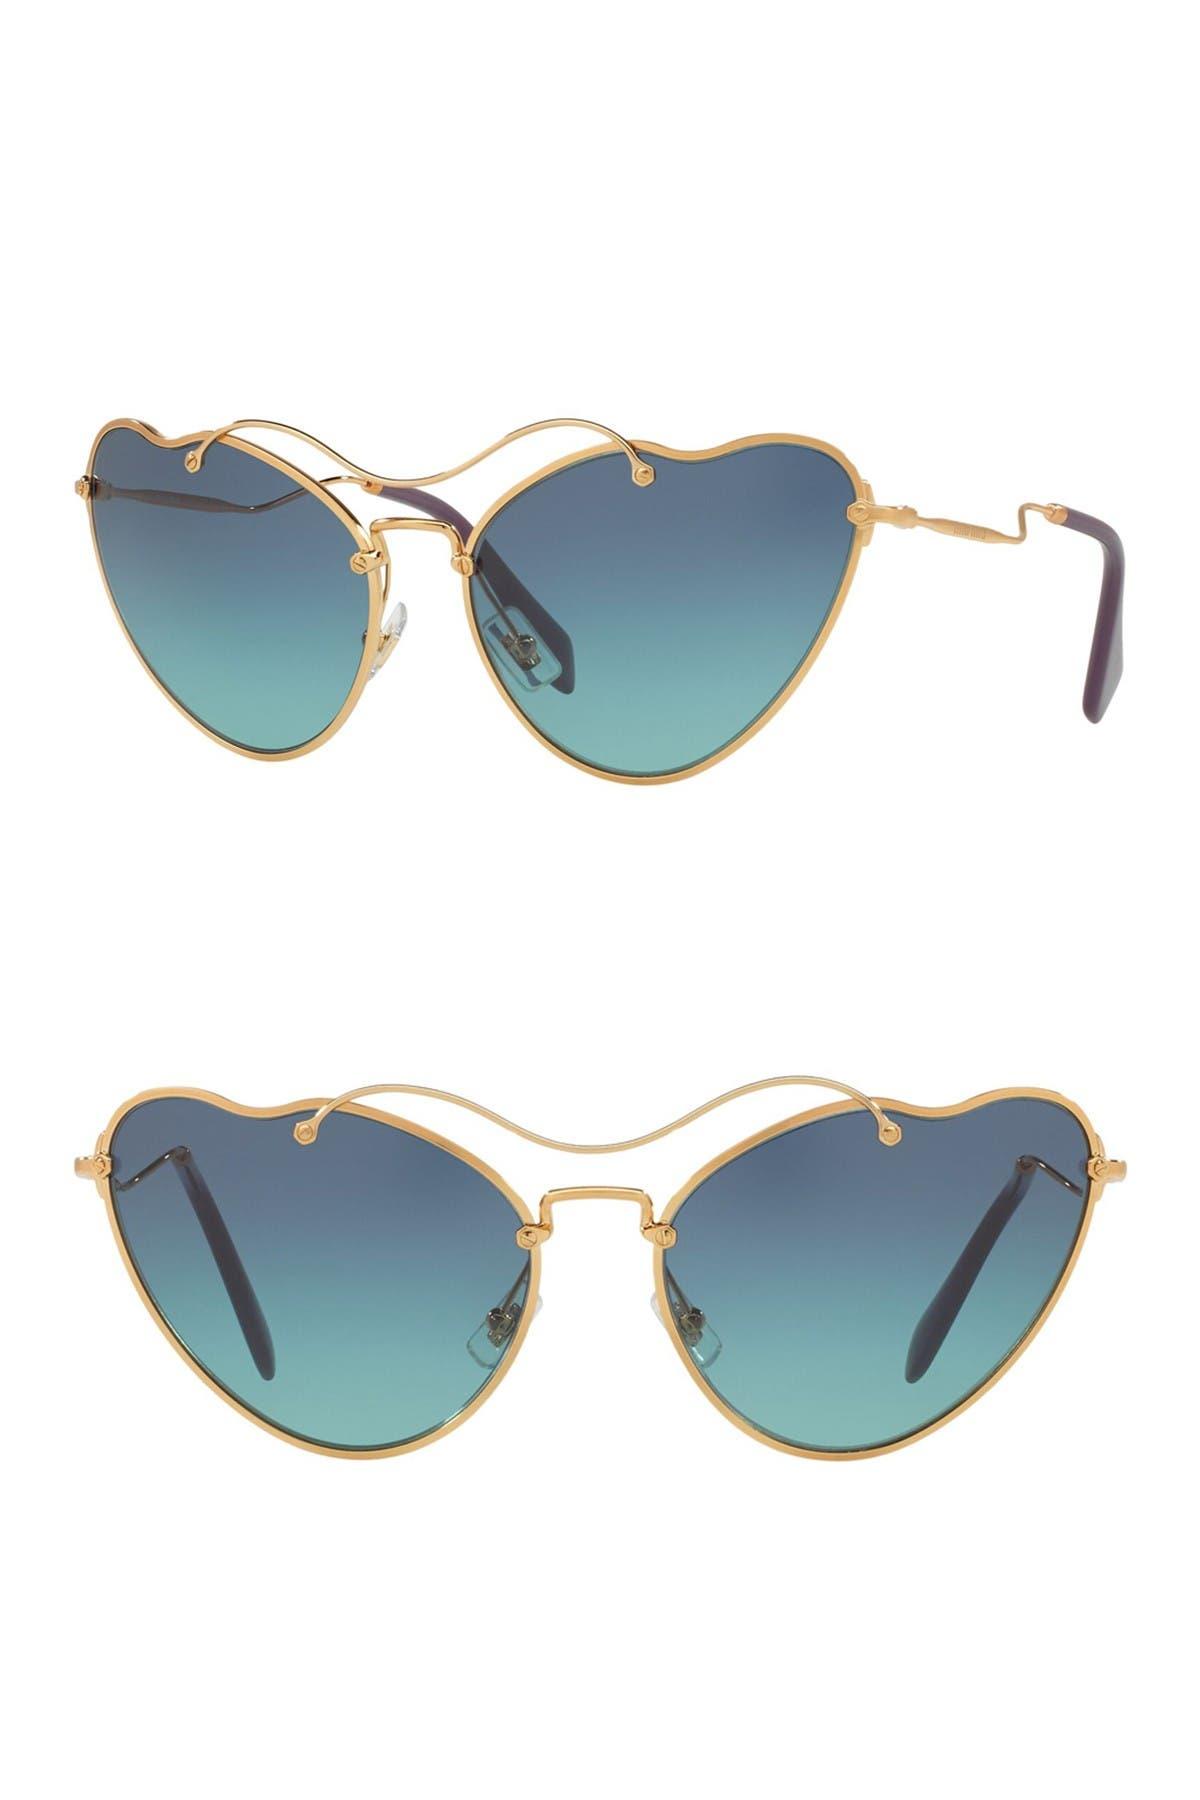 Image of MIU MIU 65mm Irregular Butterfly Sunglasses